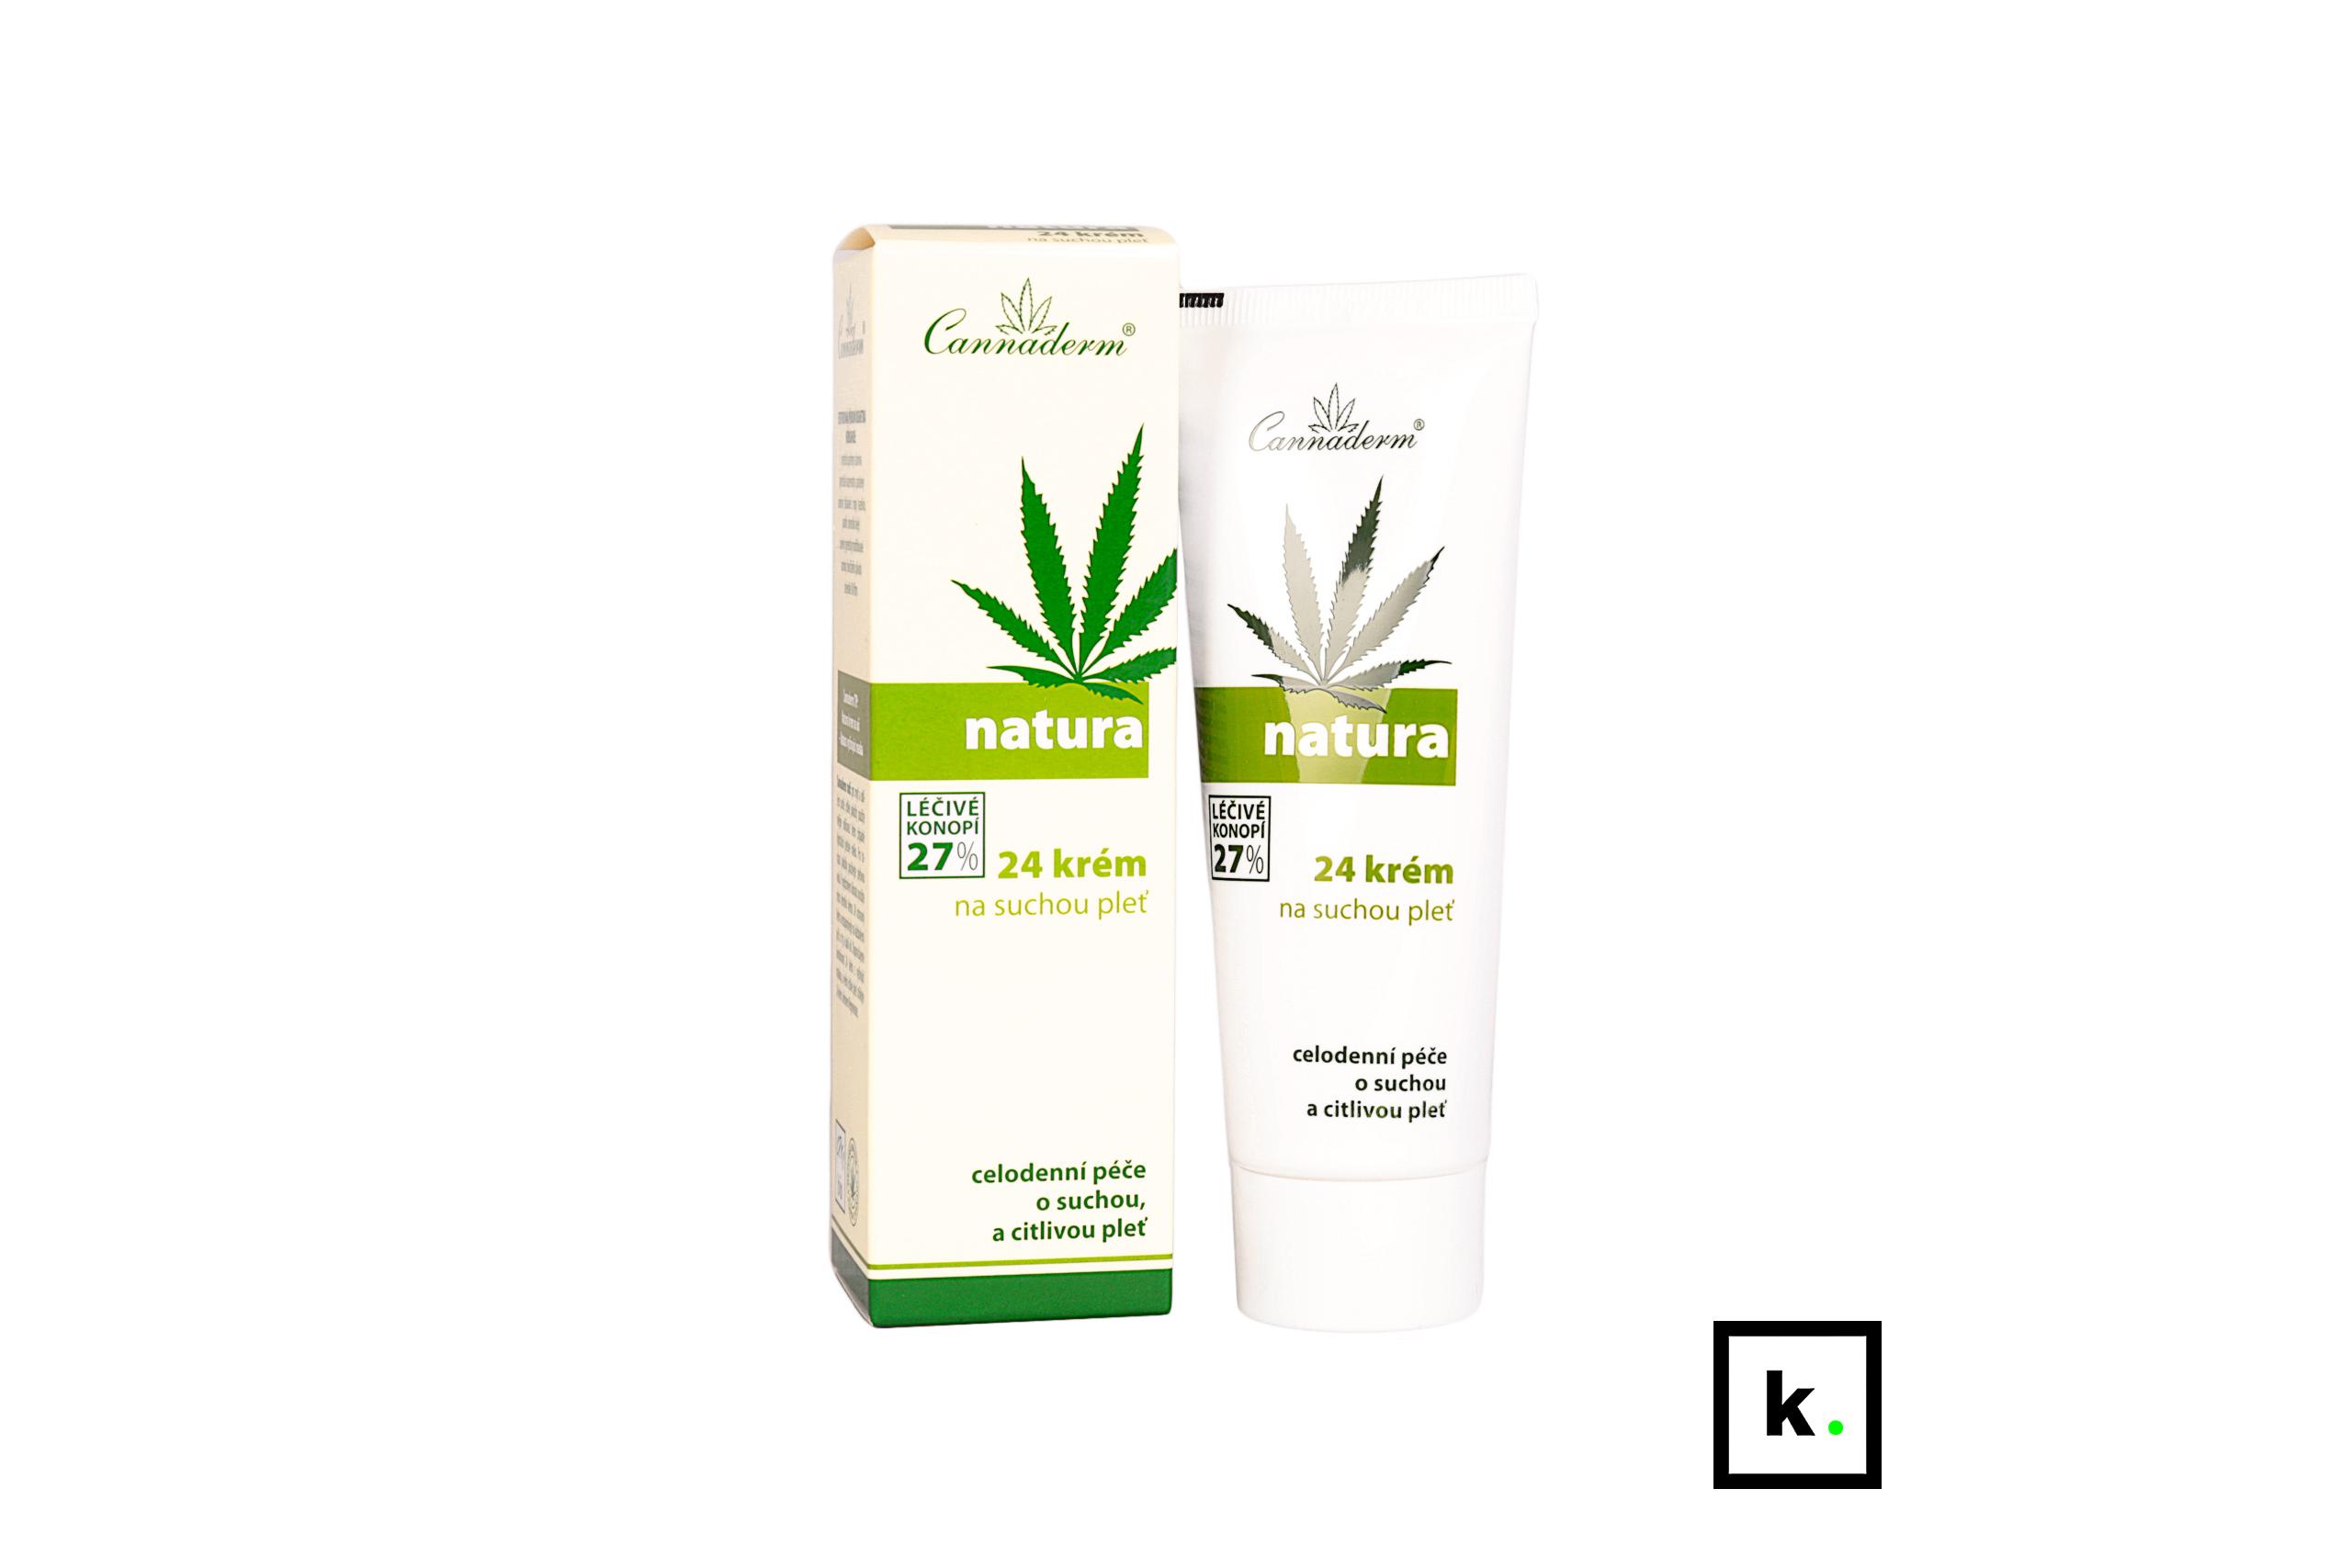 Cannaderm Natura24 konopny krem do skóry suchej i wrażliwej - 75 g